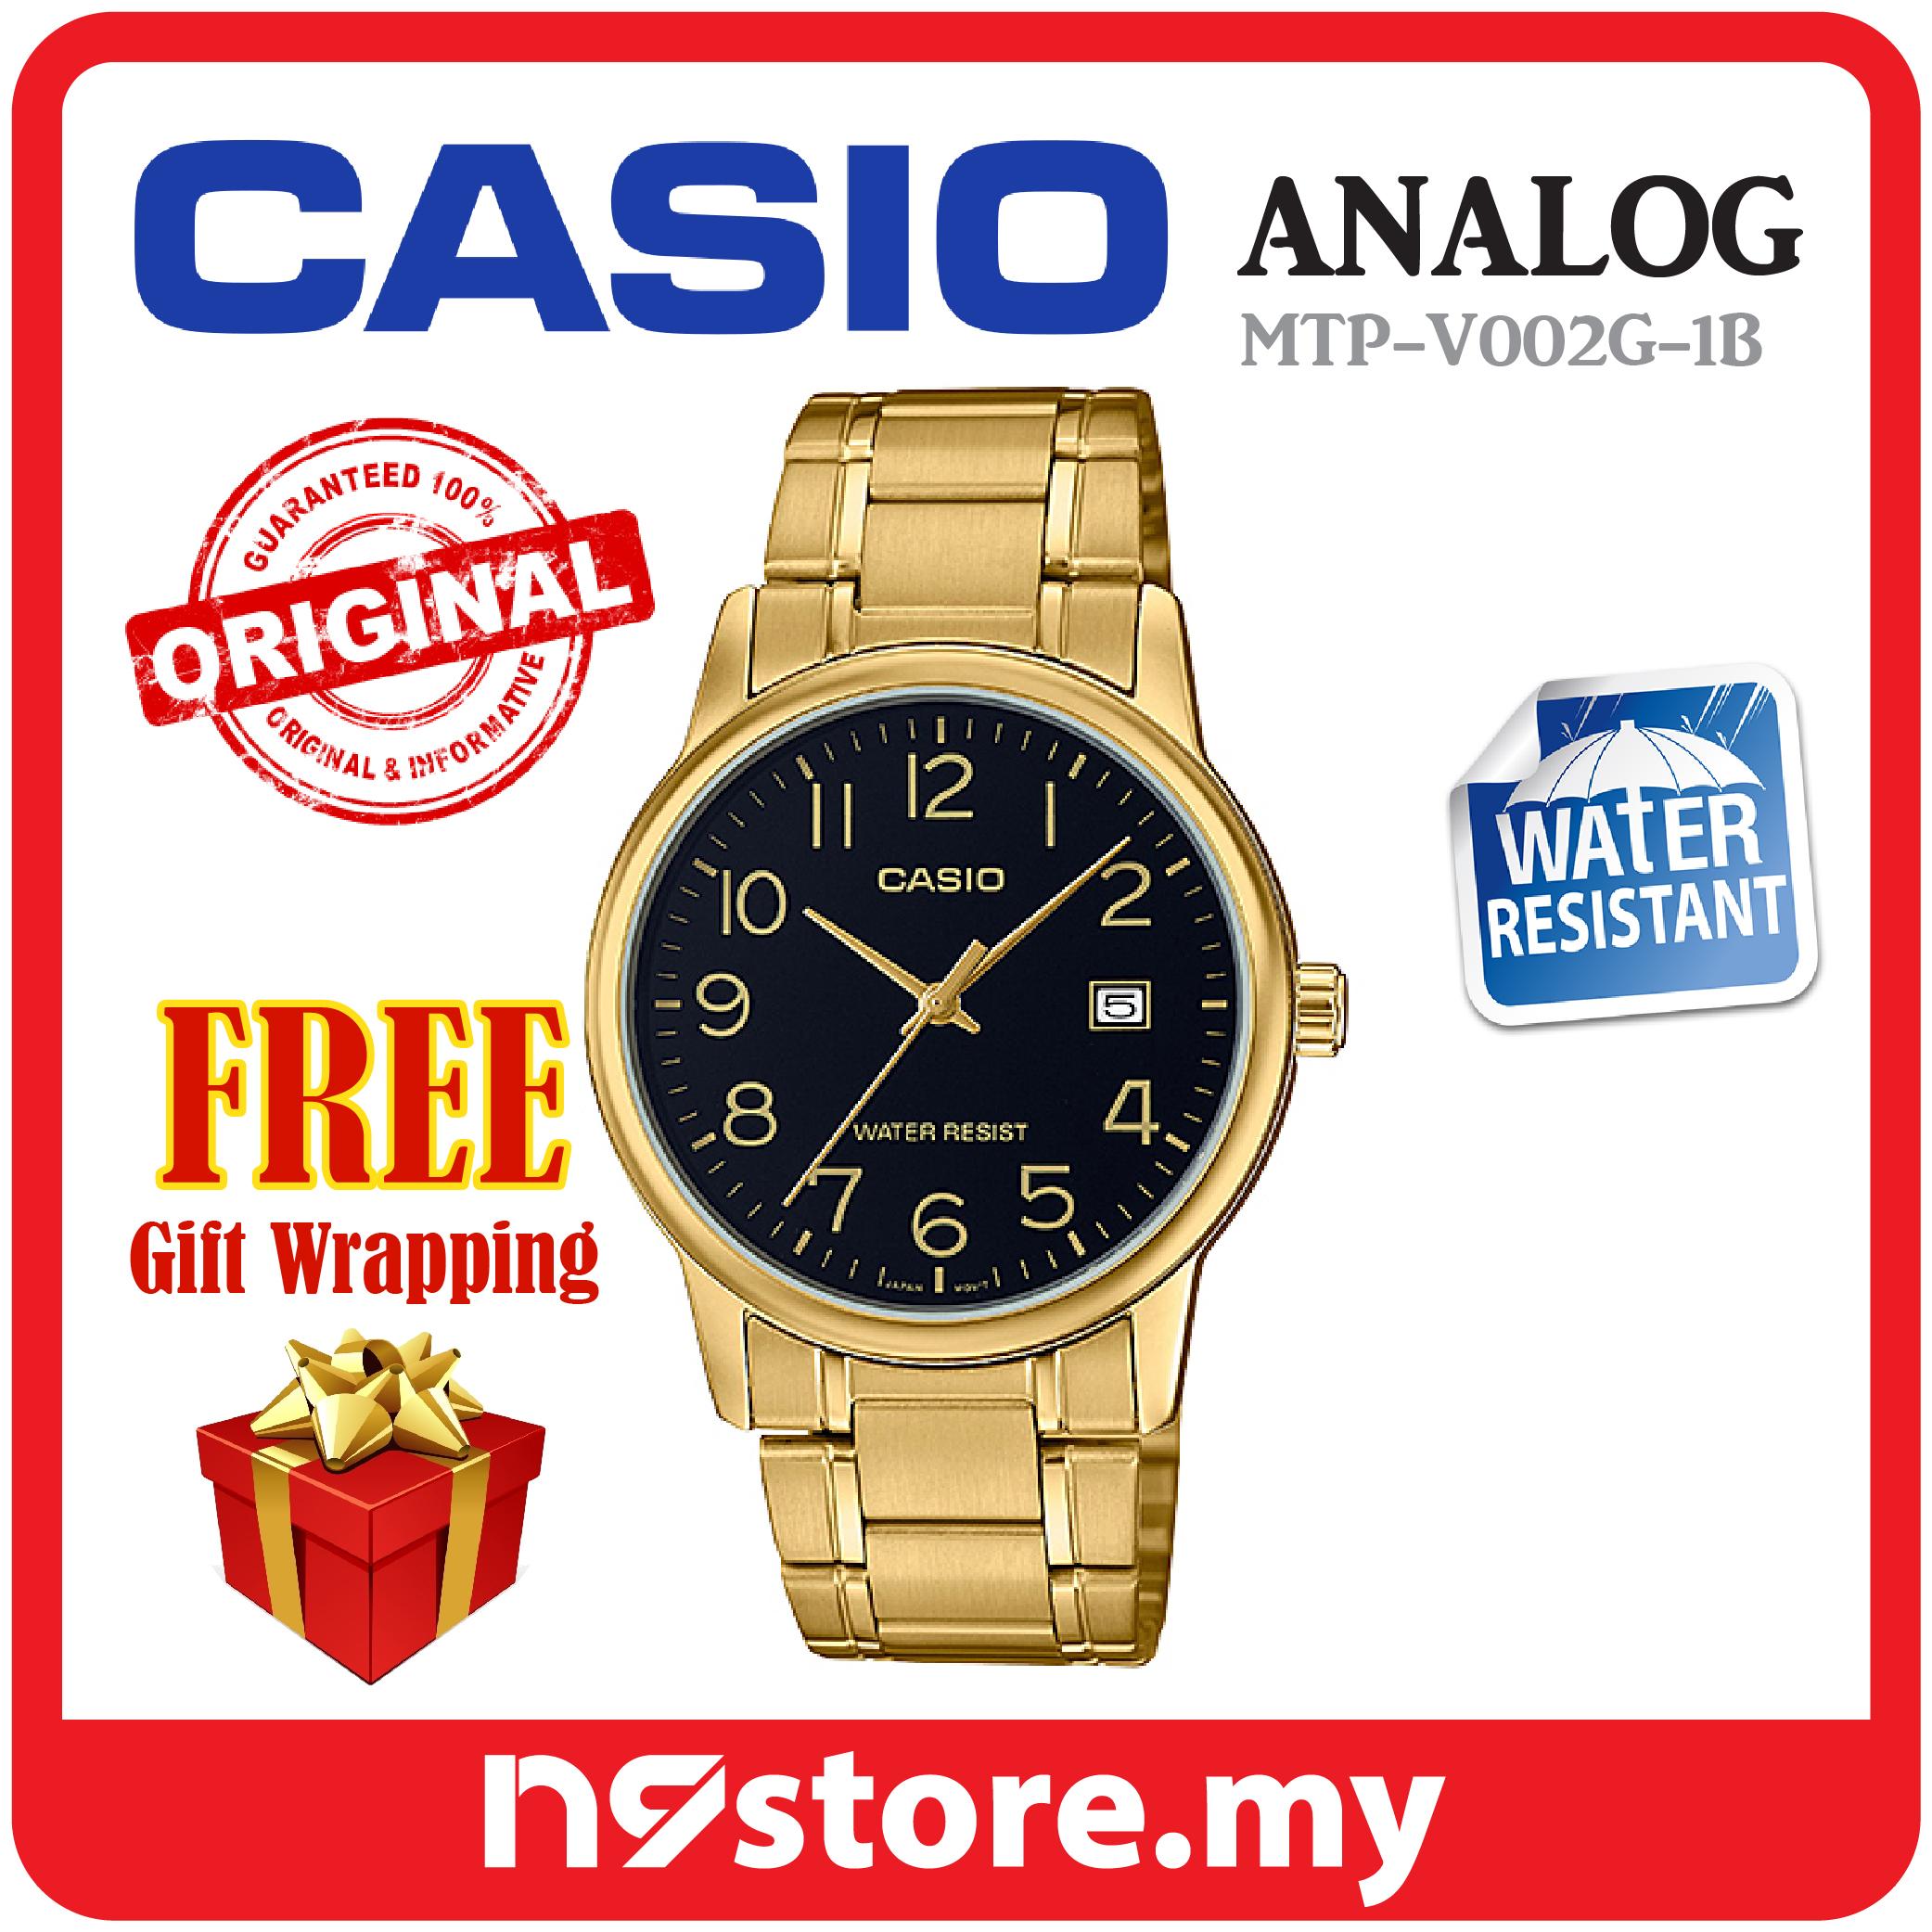 6c5159c6e Casio MTP-V002G-1B Standard Analog Men Display Date Stainless Steel Go. ‹ ›